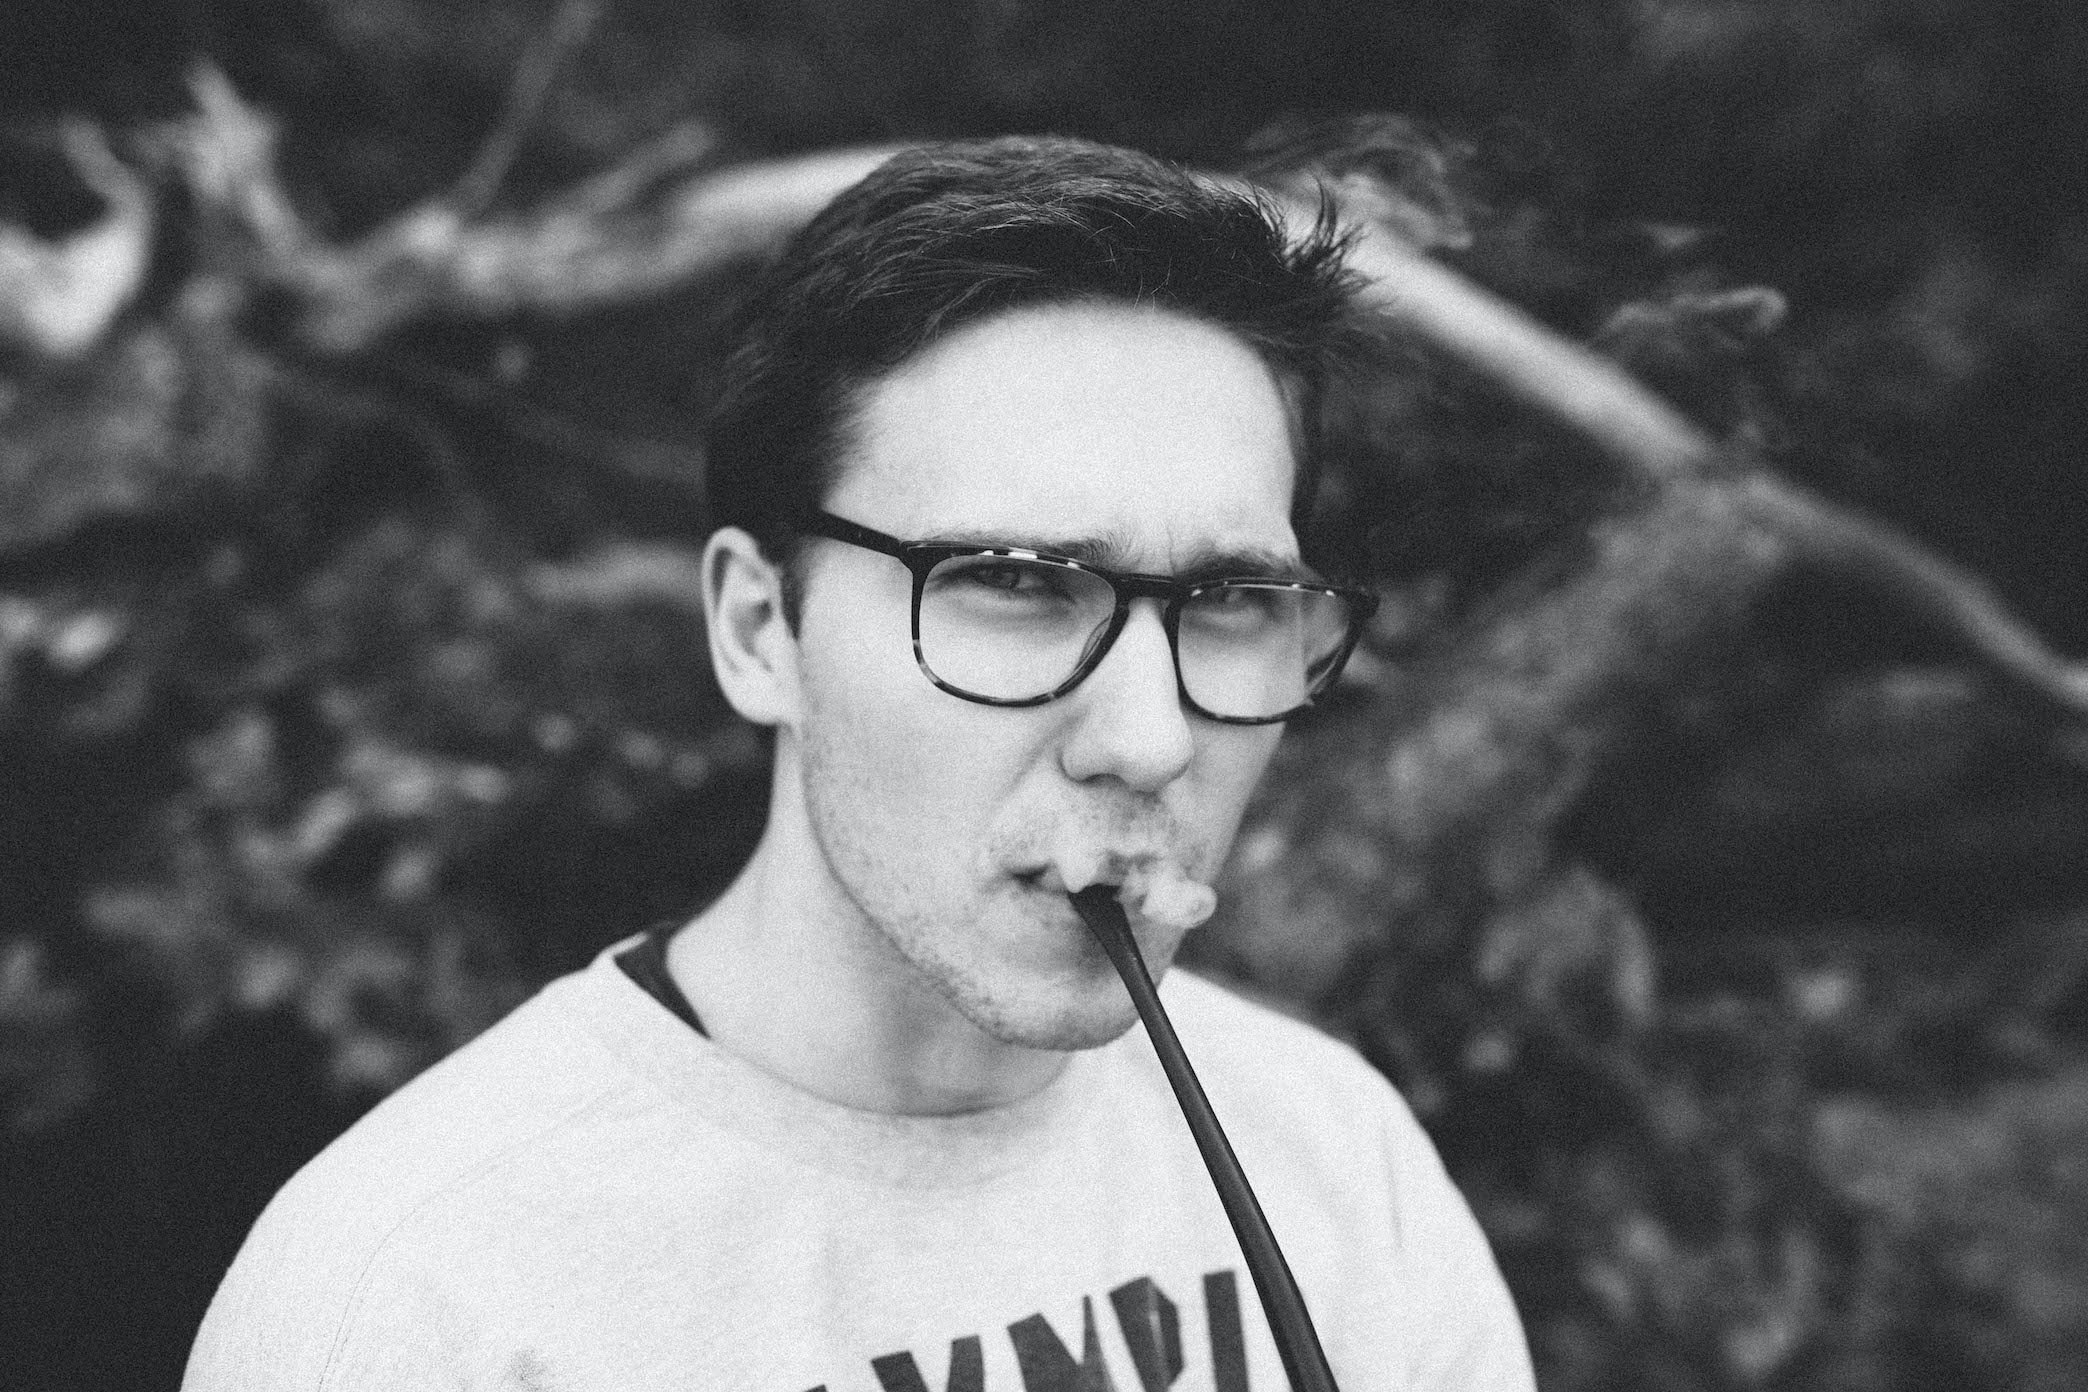 Go to Seth Ziolkowski's profile